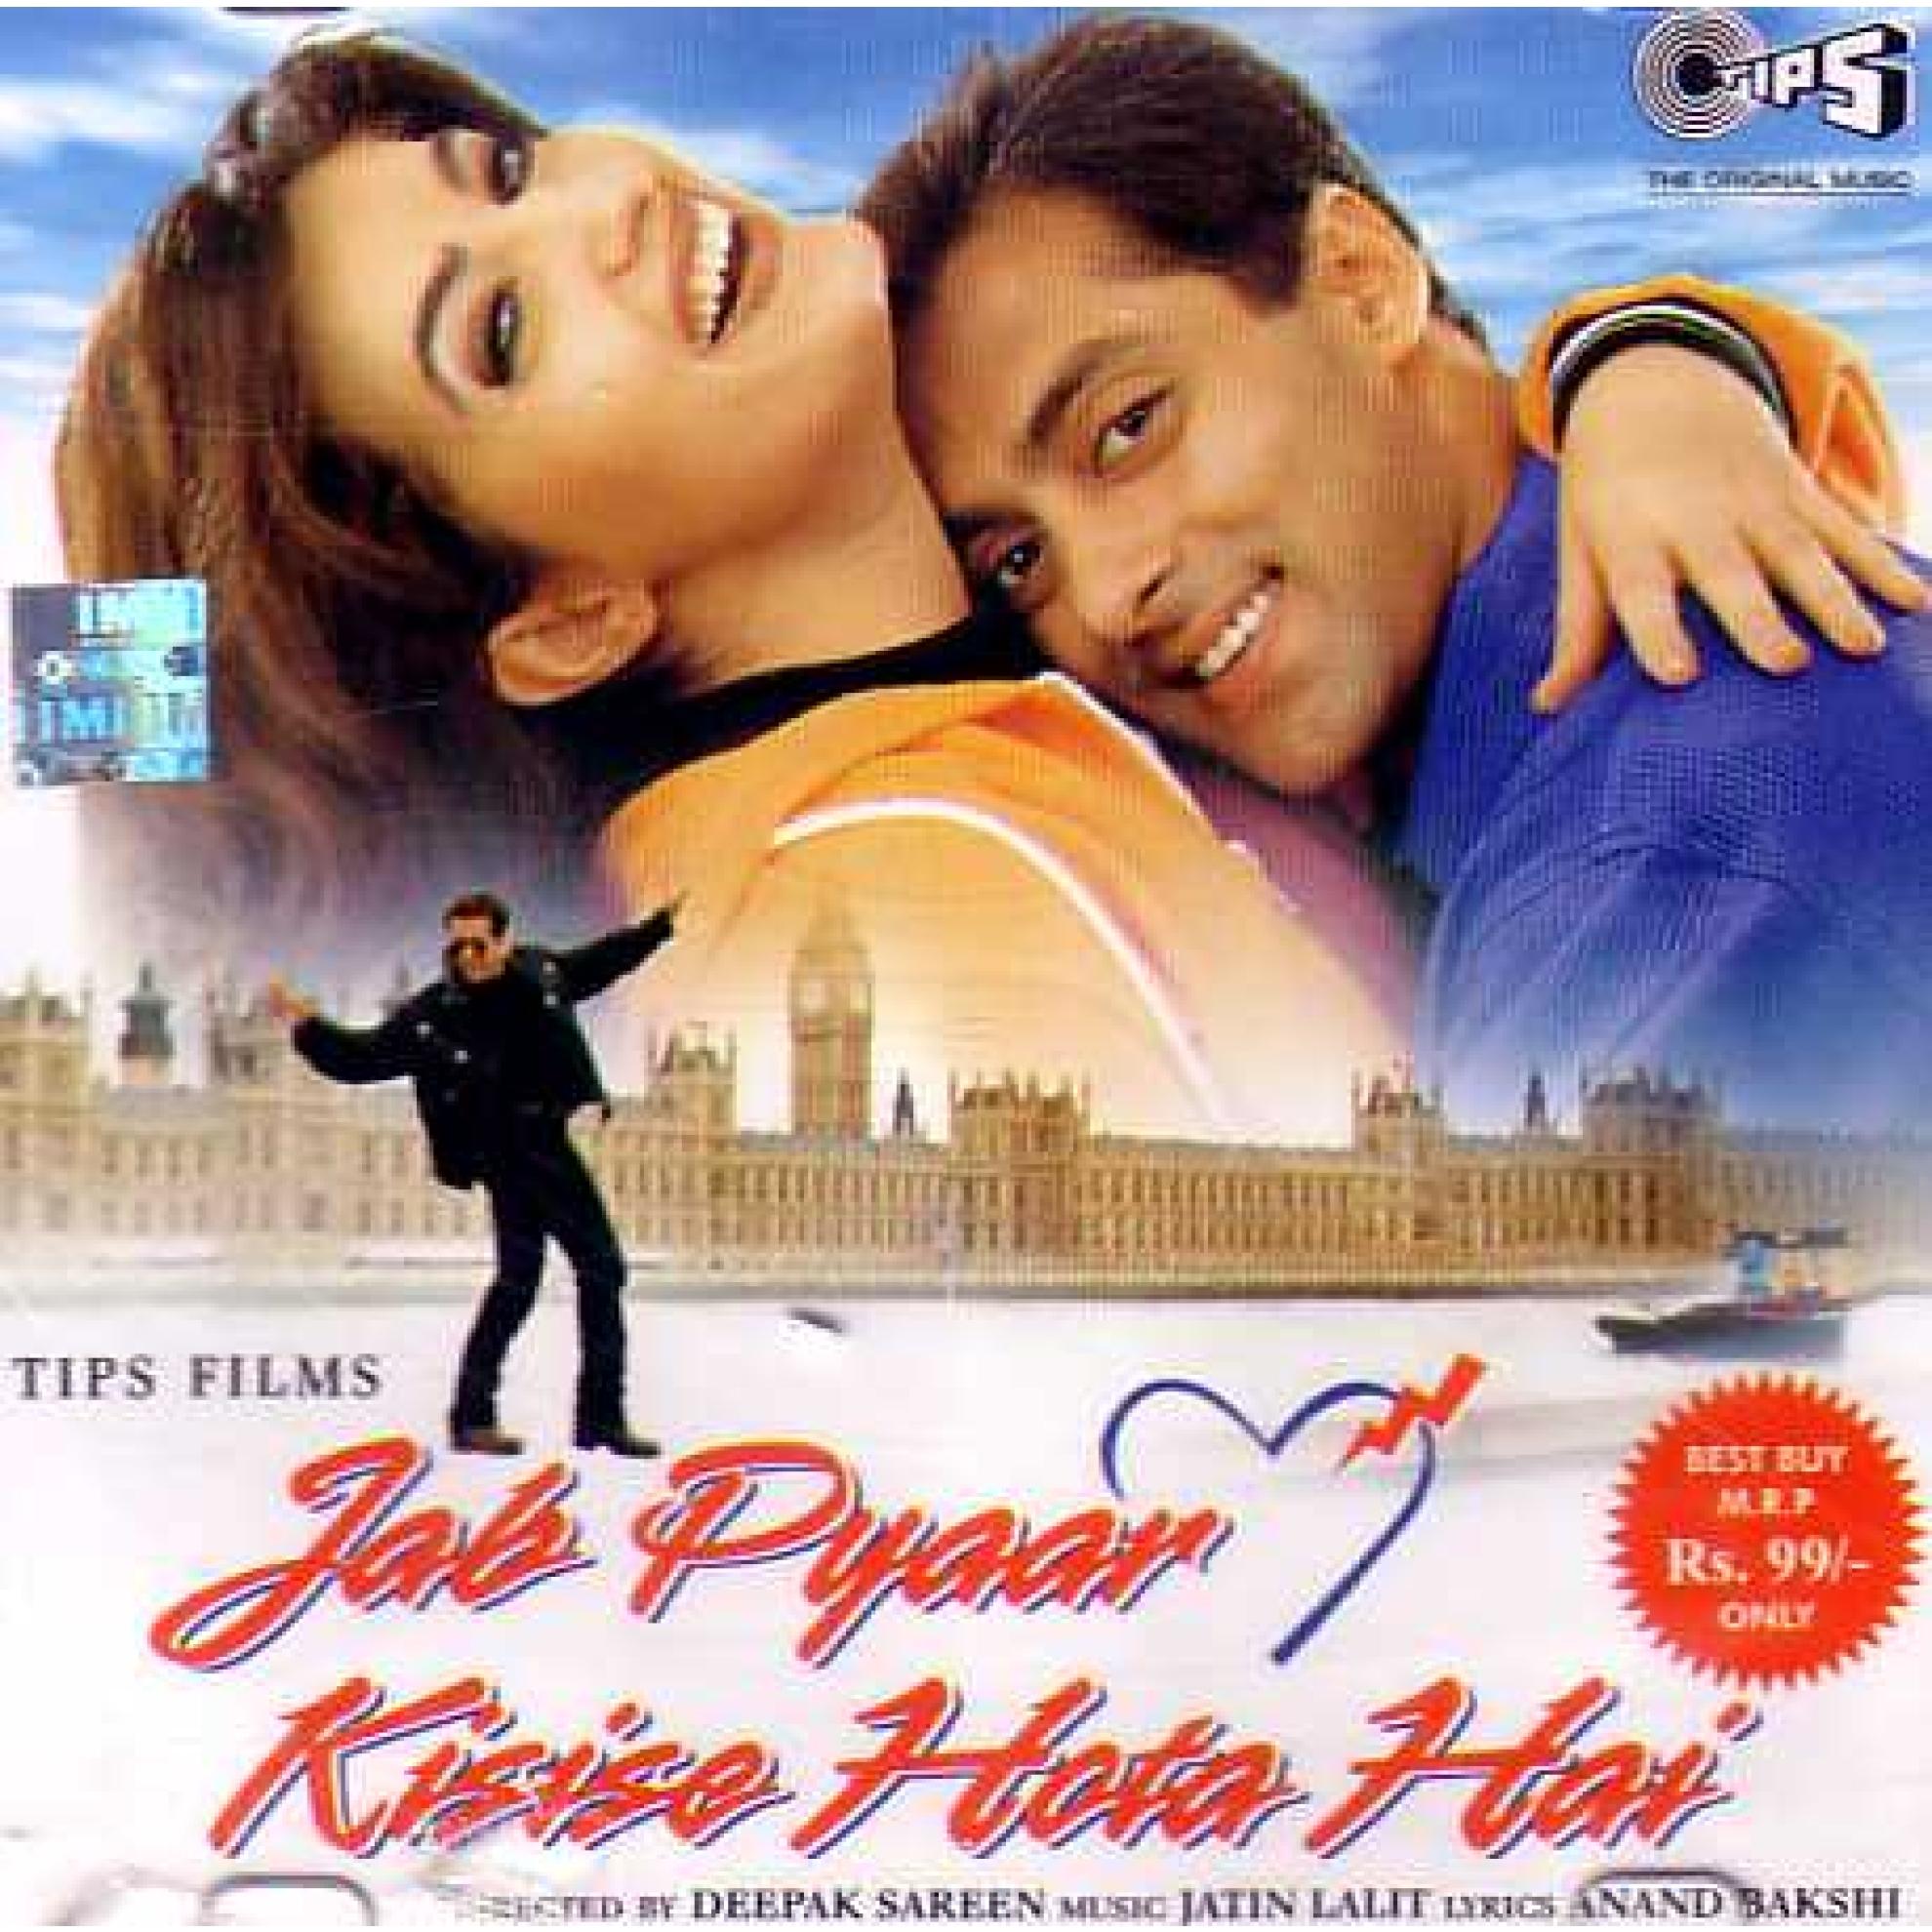 Download LOC Kargil 2003 Mp3 Songs Free DownloadHindi Movie SongsLOC Hindi HQ MP3 In 128kbps320kbps64kbps